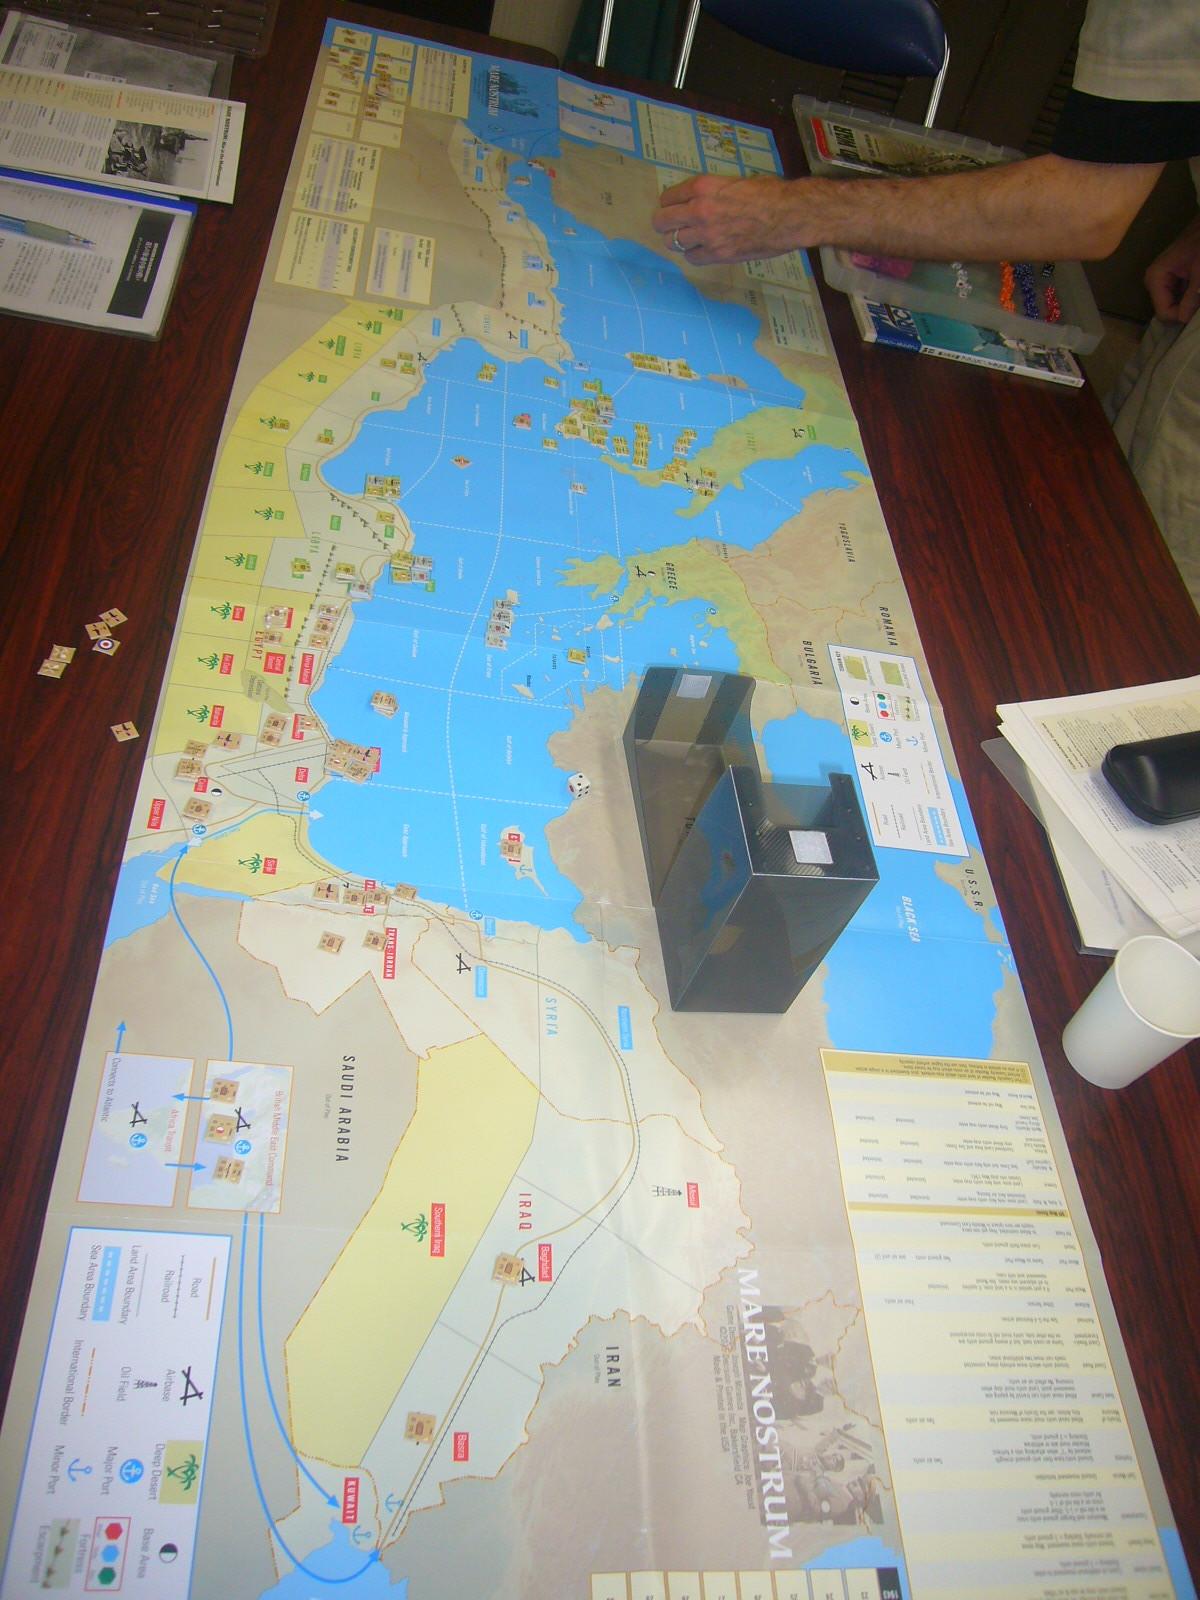 YSGA8月例会の様子その5〔これもひとつの地中海キャンペーン:(WaW誌)Mare Nostrum: War in the Mediterranean〕_b0173672_20091695.jpg